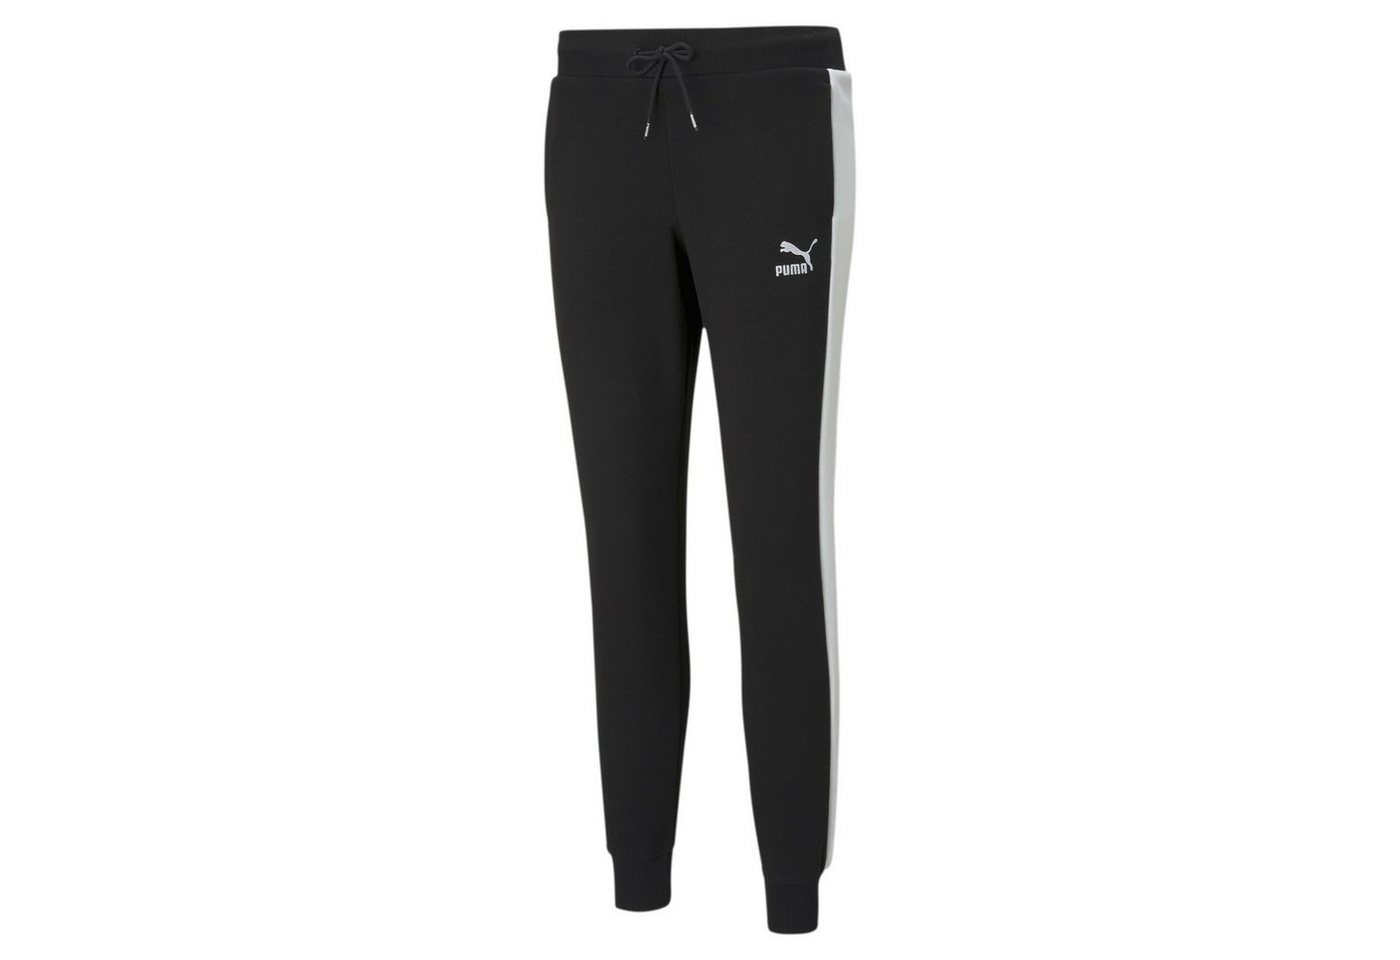 puma -  Jogginghose »Iconic T7 Damen Trainingshose«